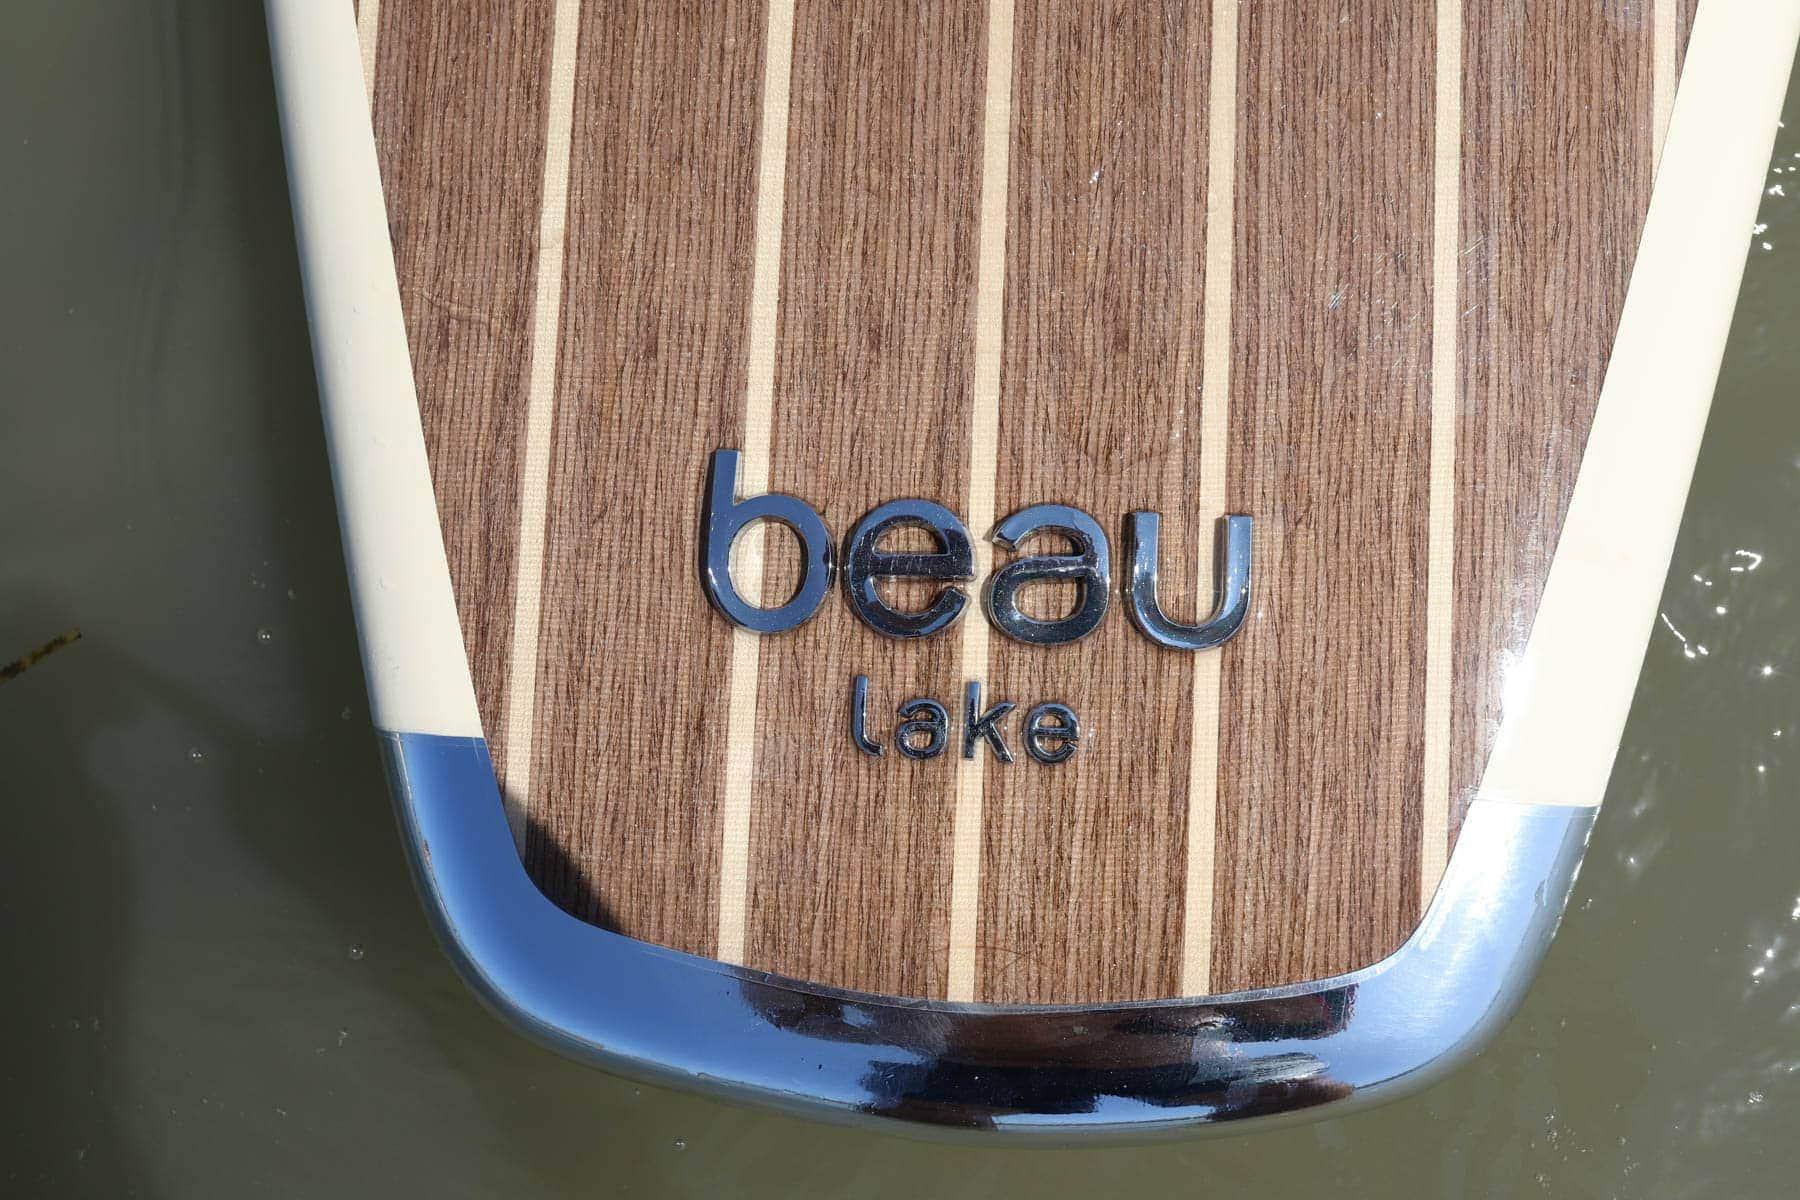 Beau Lake #familytravelsandiego #sandiego #fourseasonsresidenceclub #bigfamilytravel